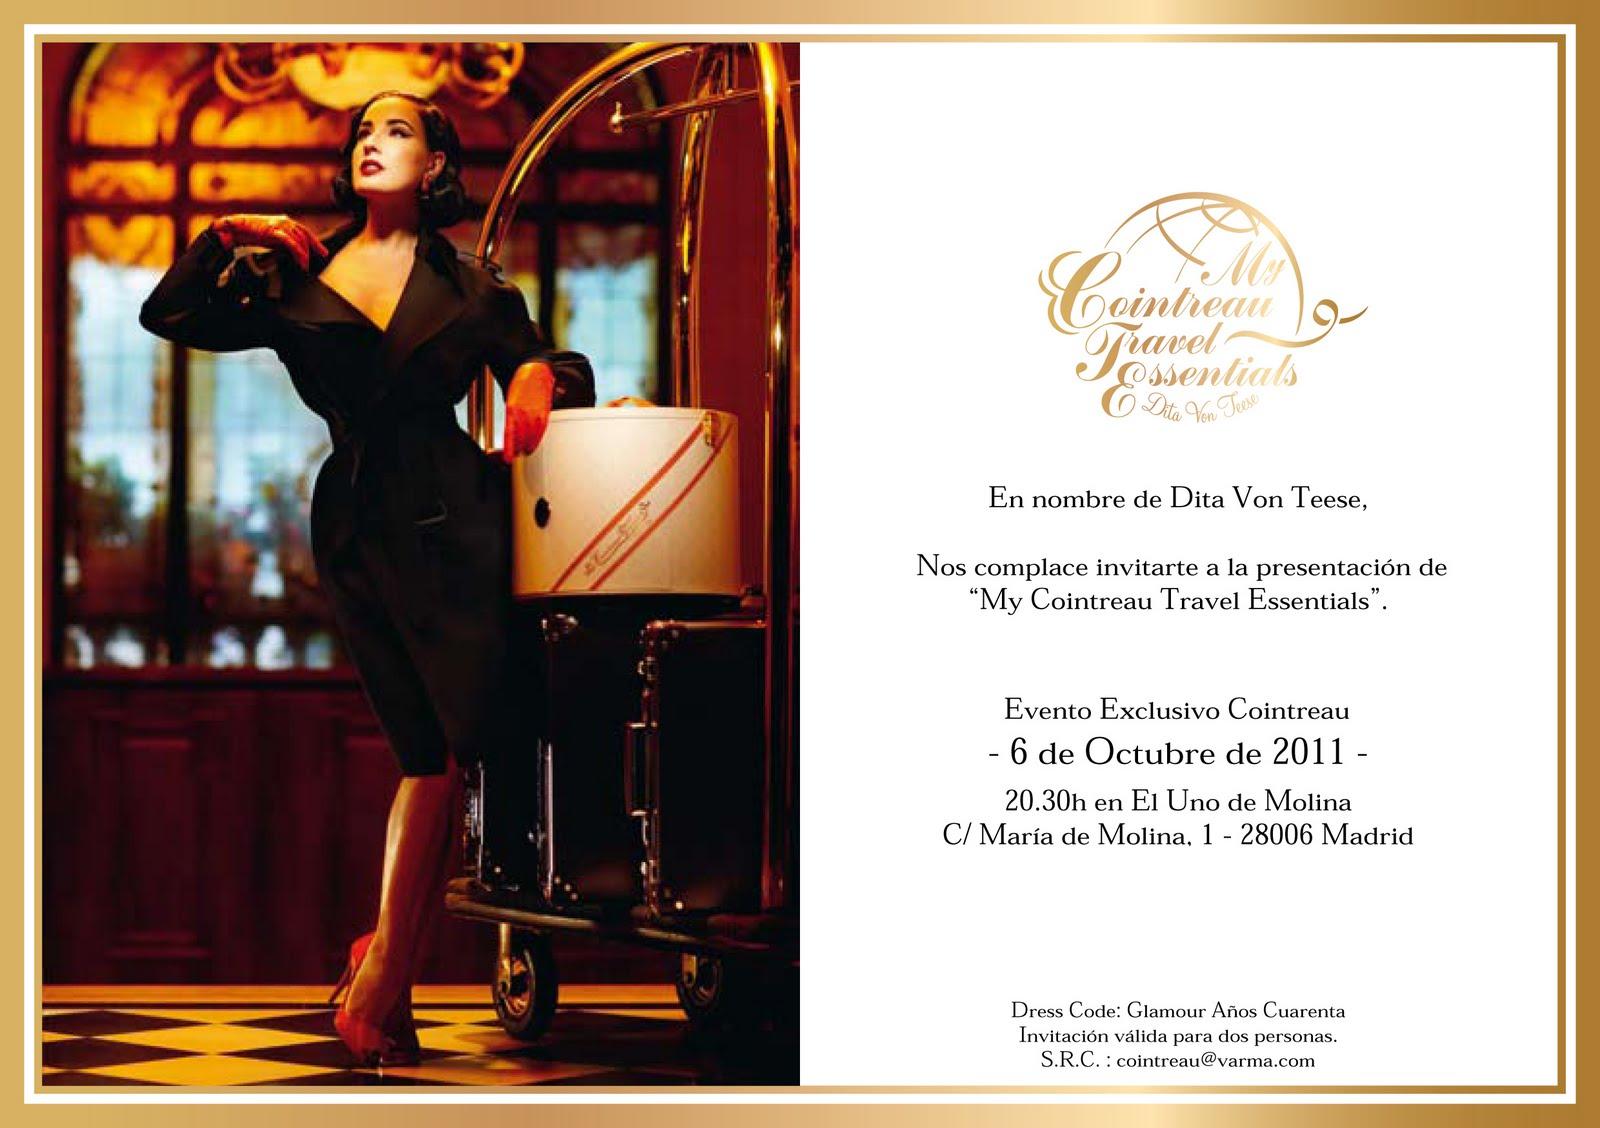 http://1.bp.blogspot.com/-AdLxFVJcE_k/TpYKuI8Y1NI/AAAAAAAABzg/hqDtJp8rNdQ/s1600/invitacion_evento_27092011.jpg